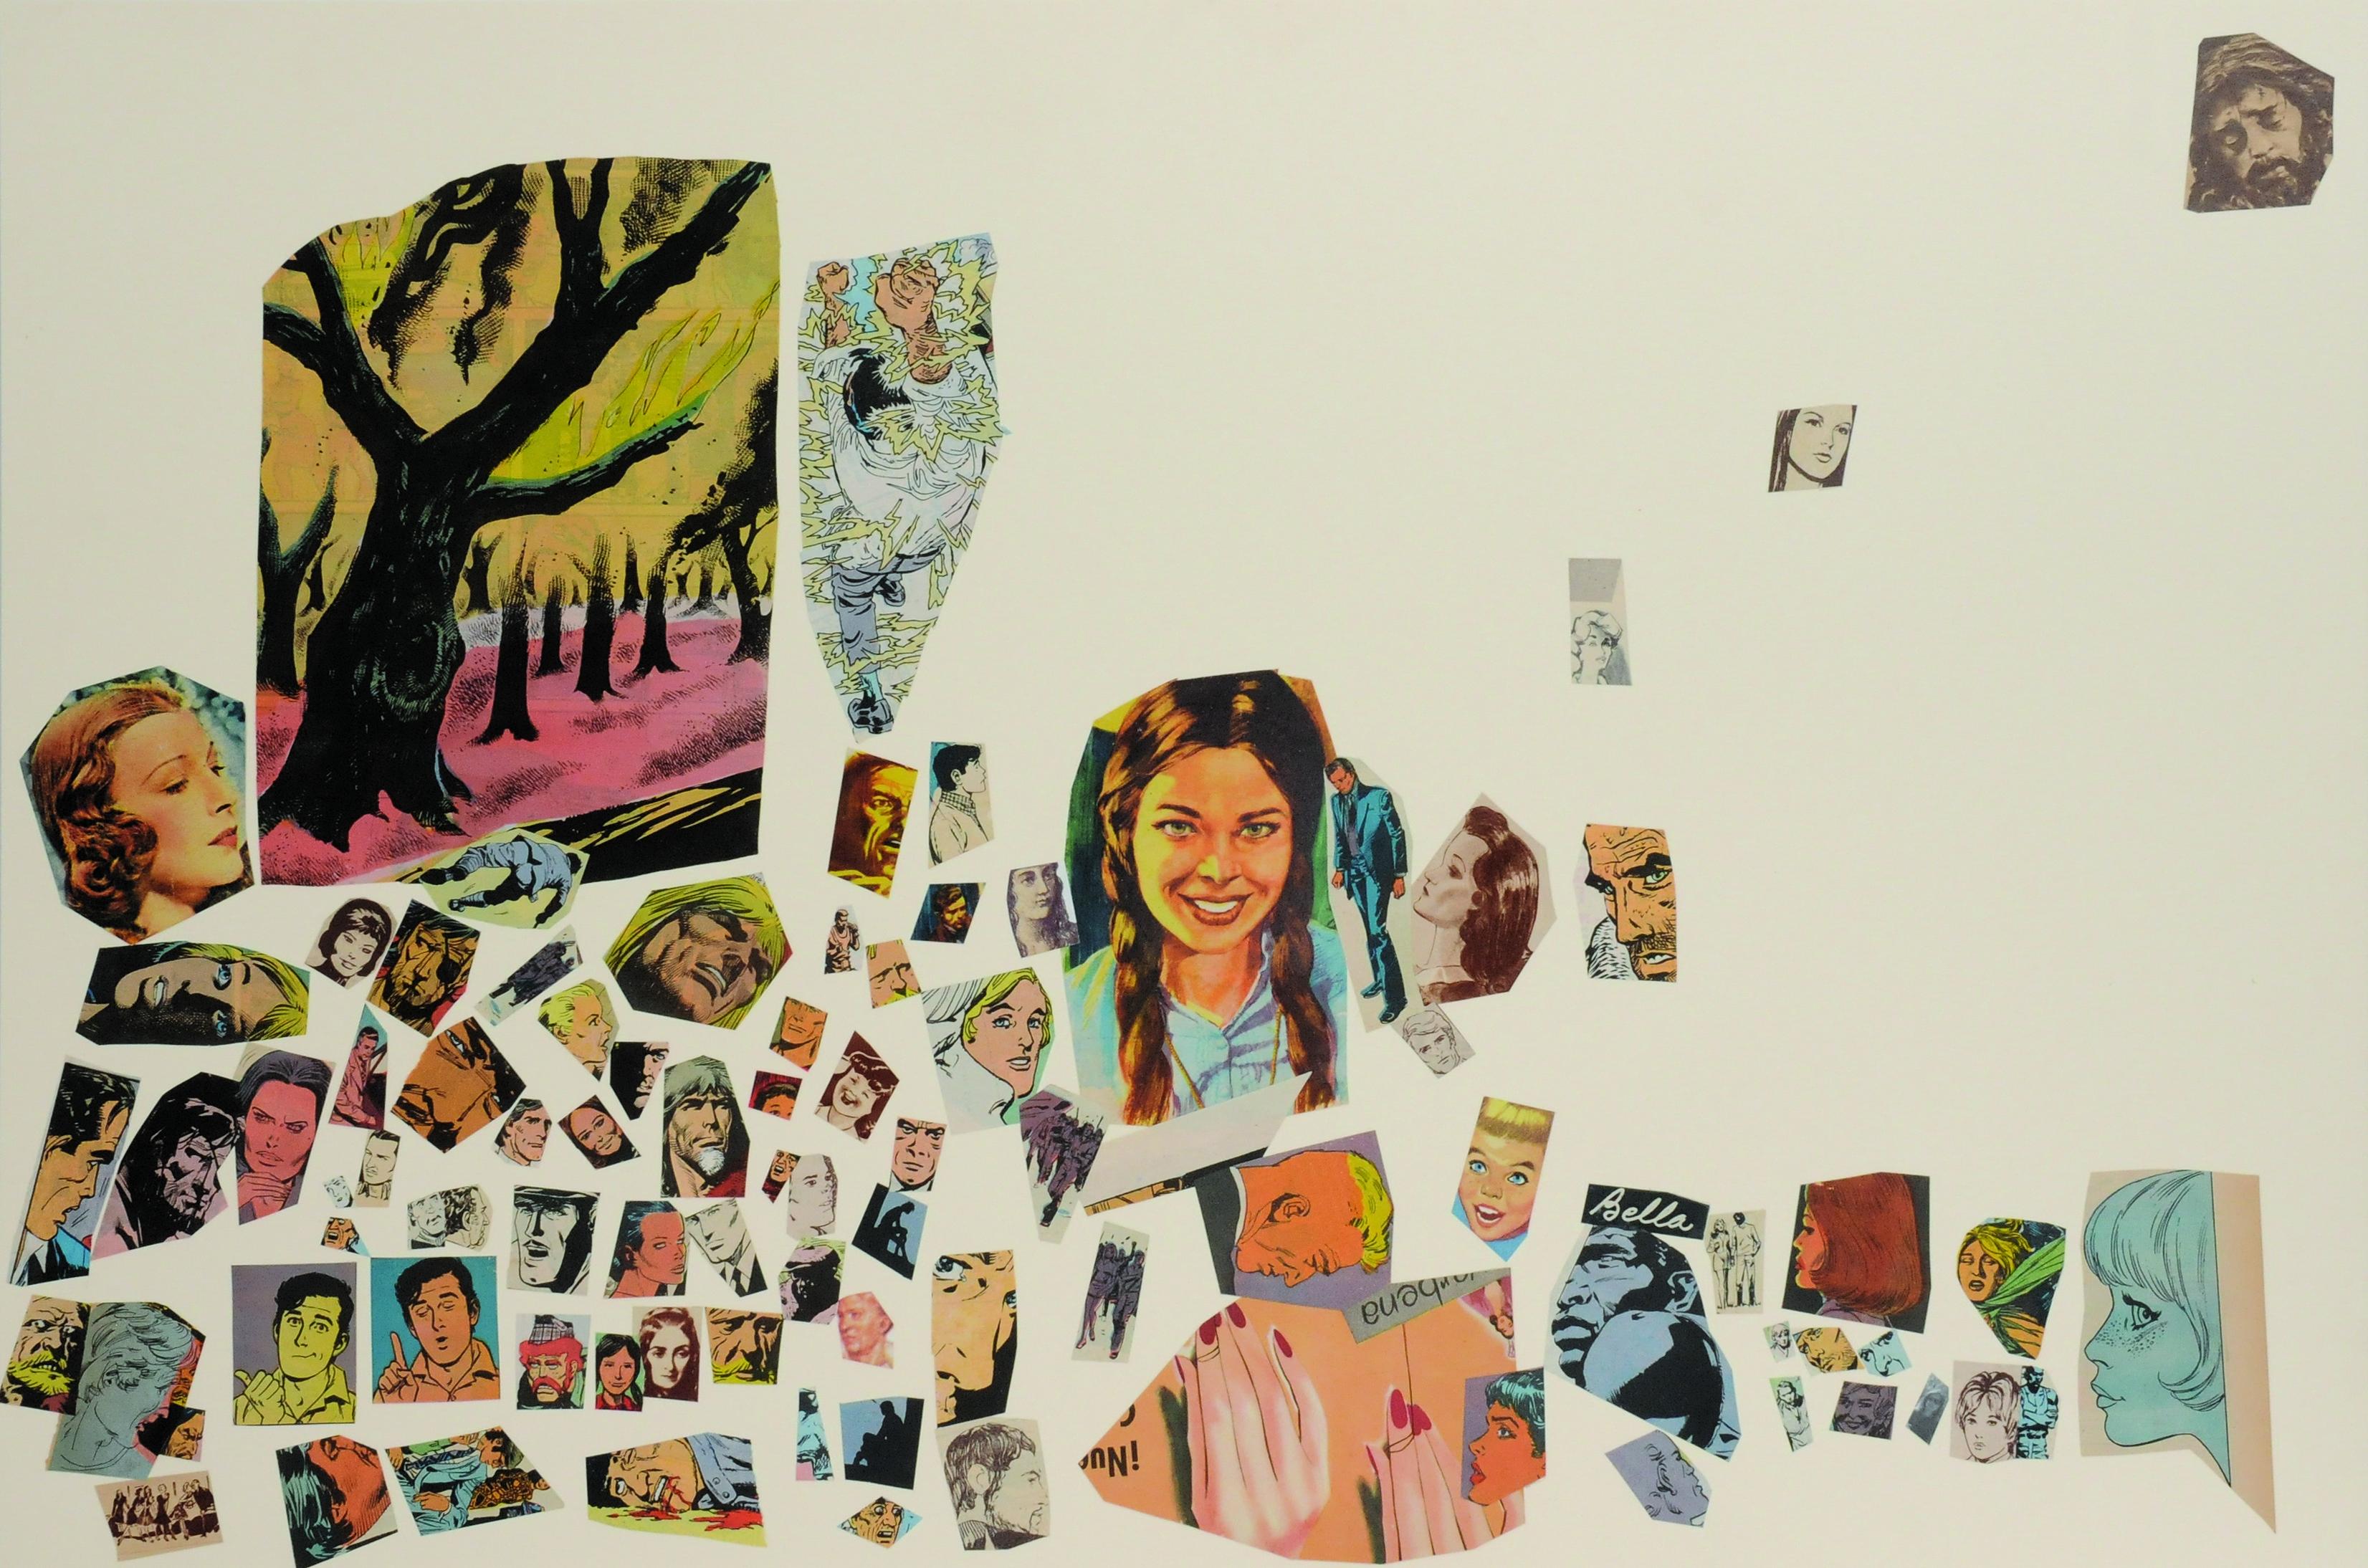 Bella, papel collage, 51 cm x 76 cm. 2008